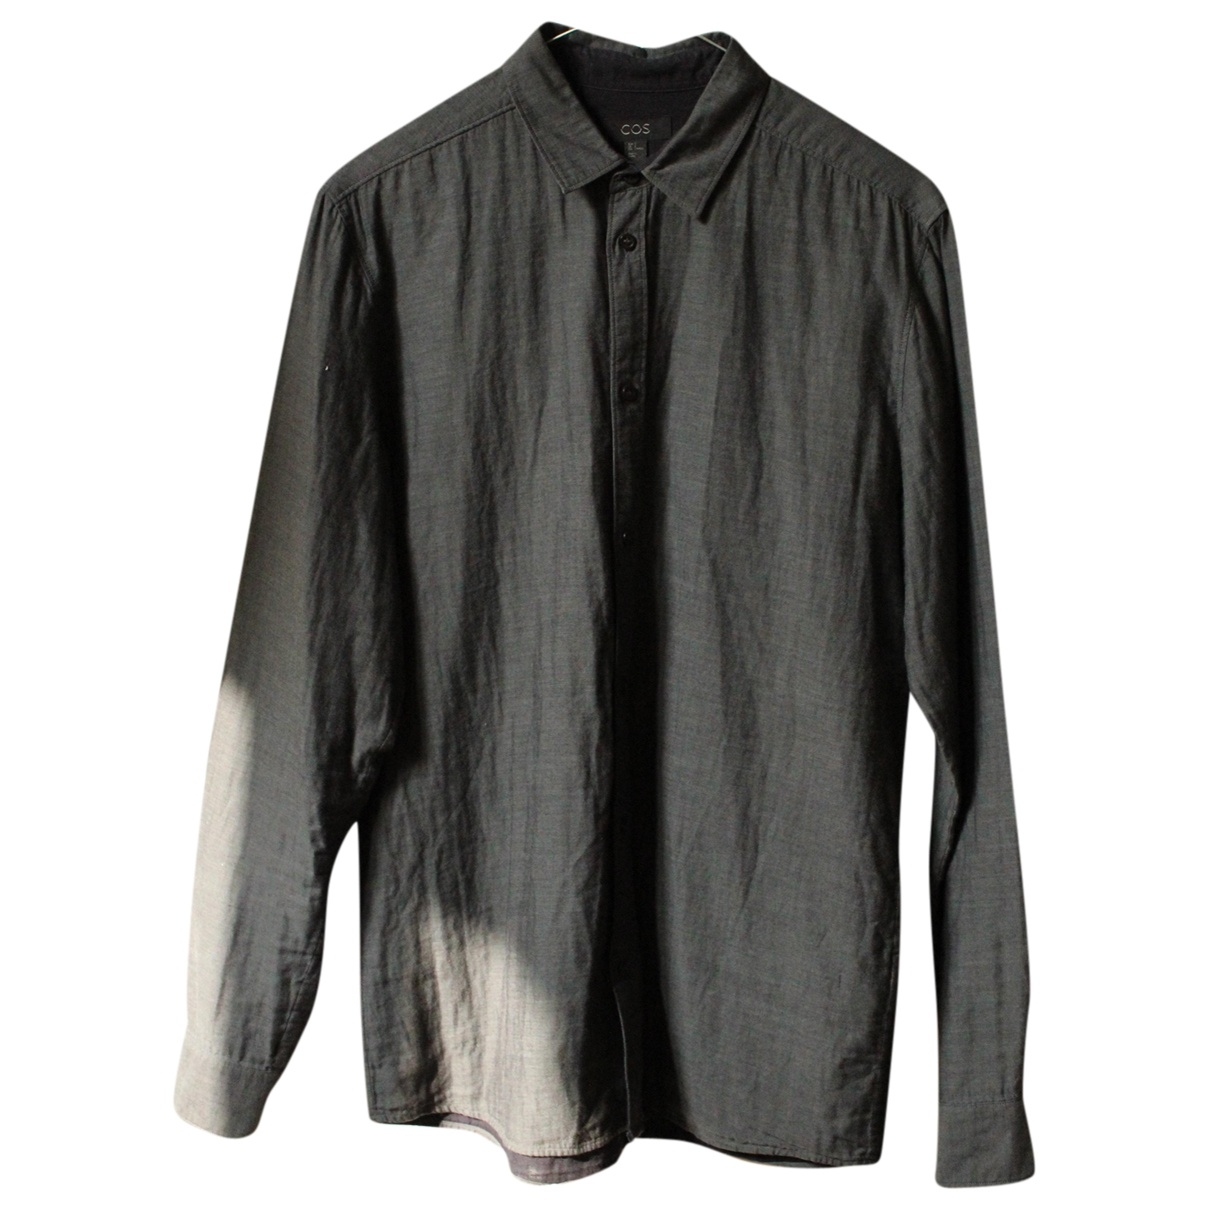 Cos \N Grey Cotton Shirts for Men S International